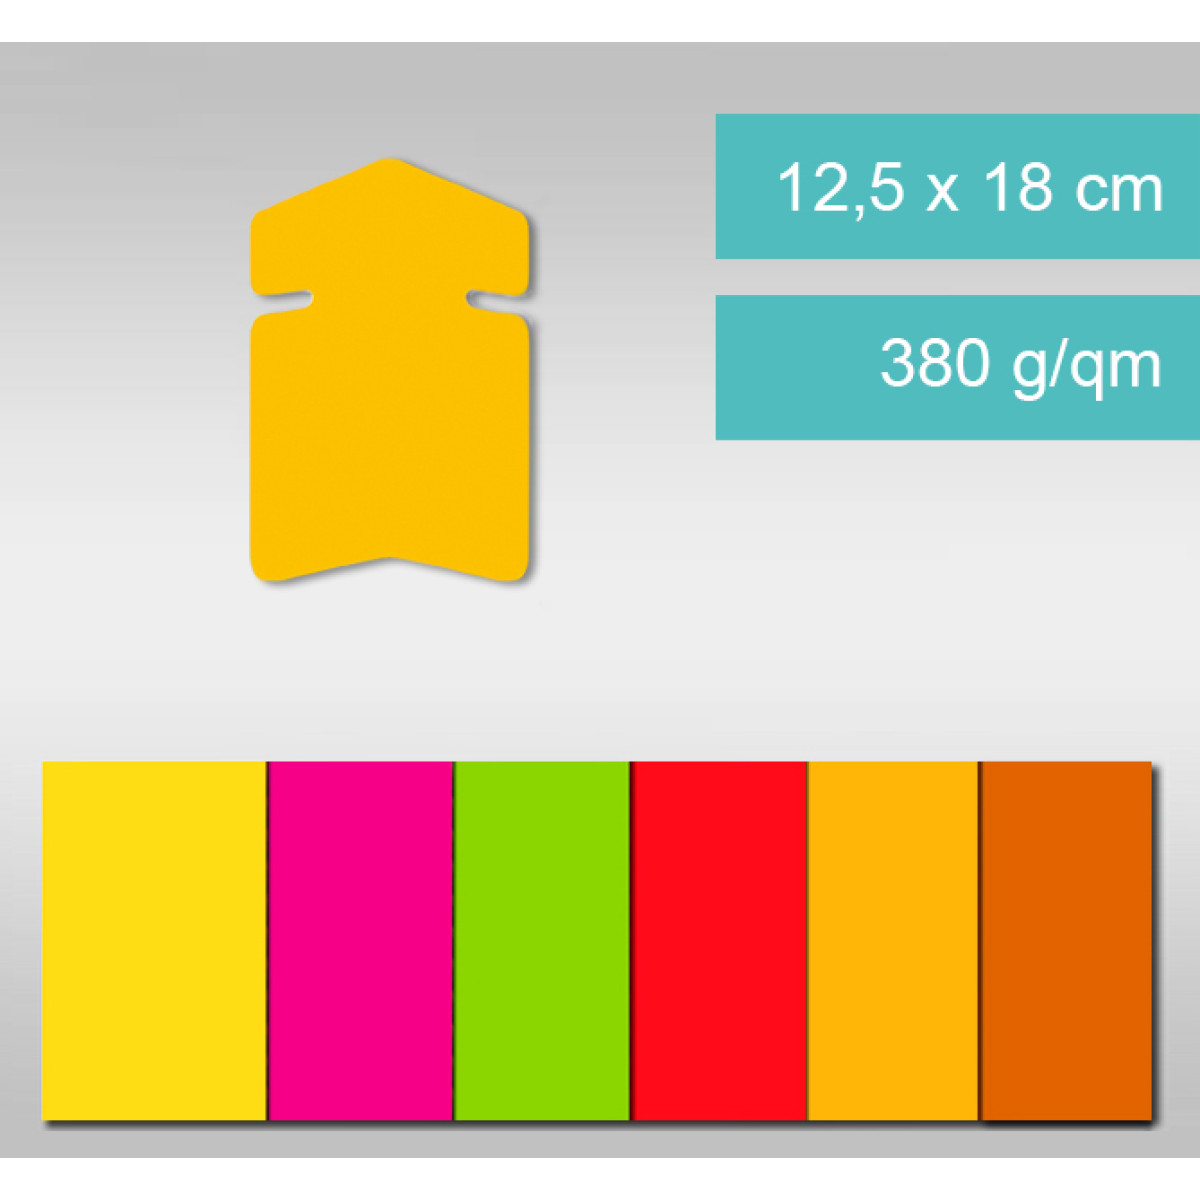 Pfeile aus Leuchtfarbenkarton 12,5 x 18 cm - 25 Stück